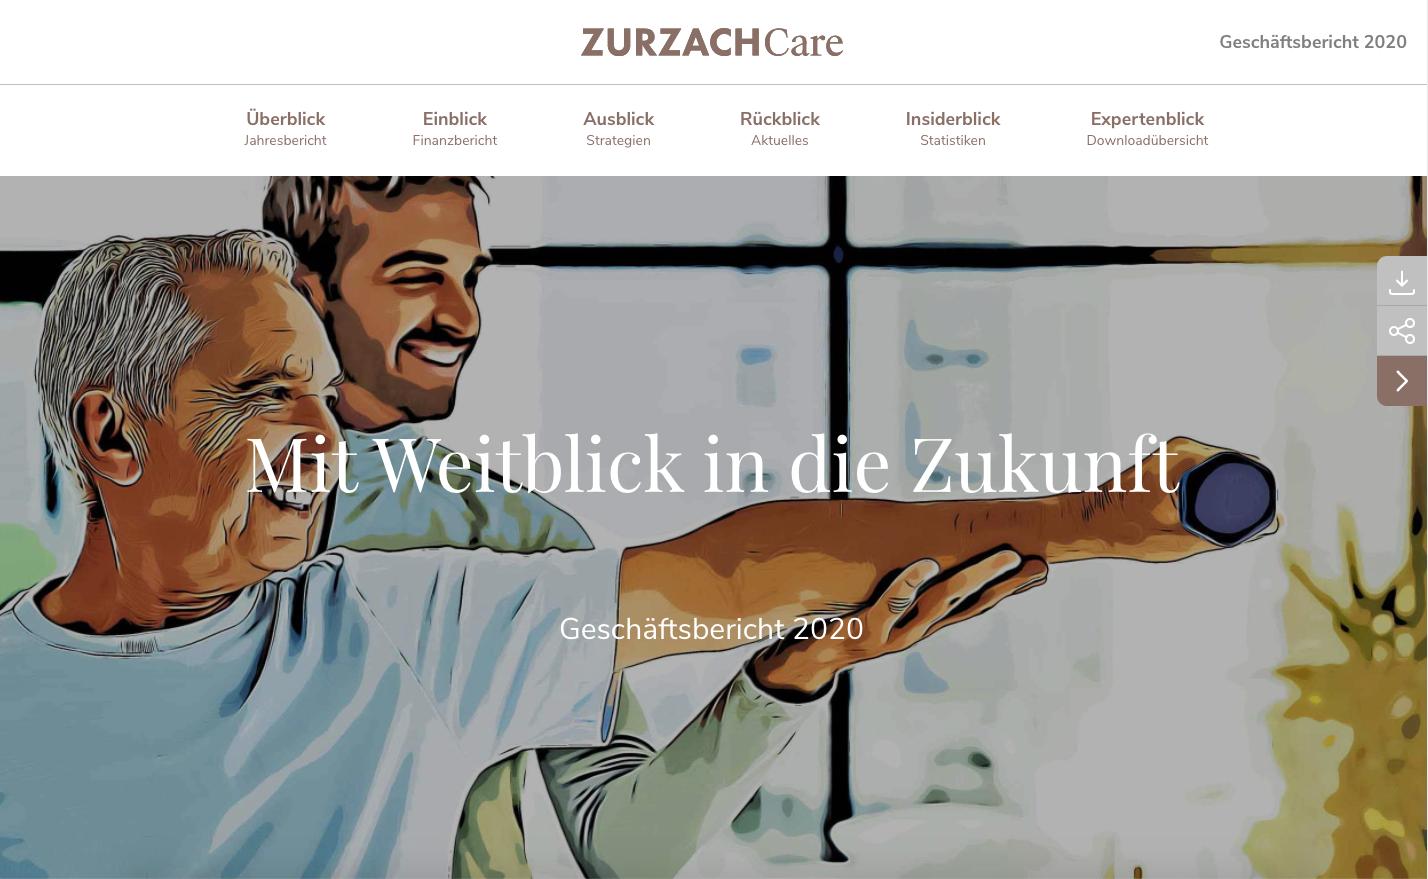 W4_News_Zurzach_Care_GB_4